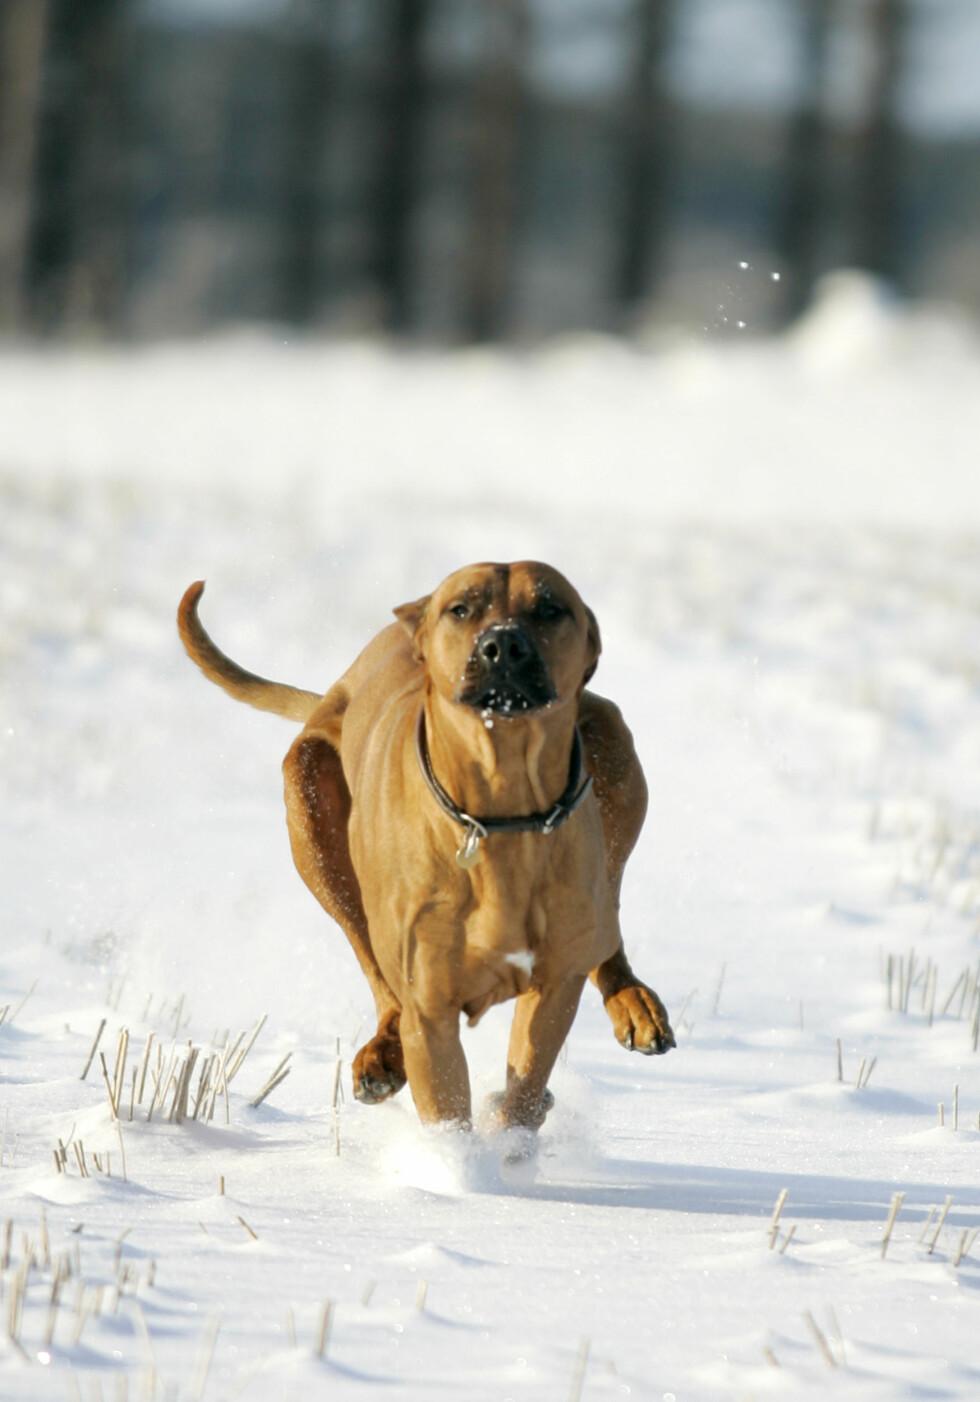 Sol og masse snø betyr at du kan knipse med svært korte lukkertid og dermed fryse et actionbilde. Foto: Colourbox.com